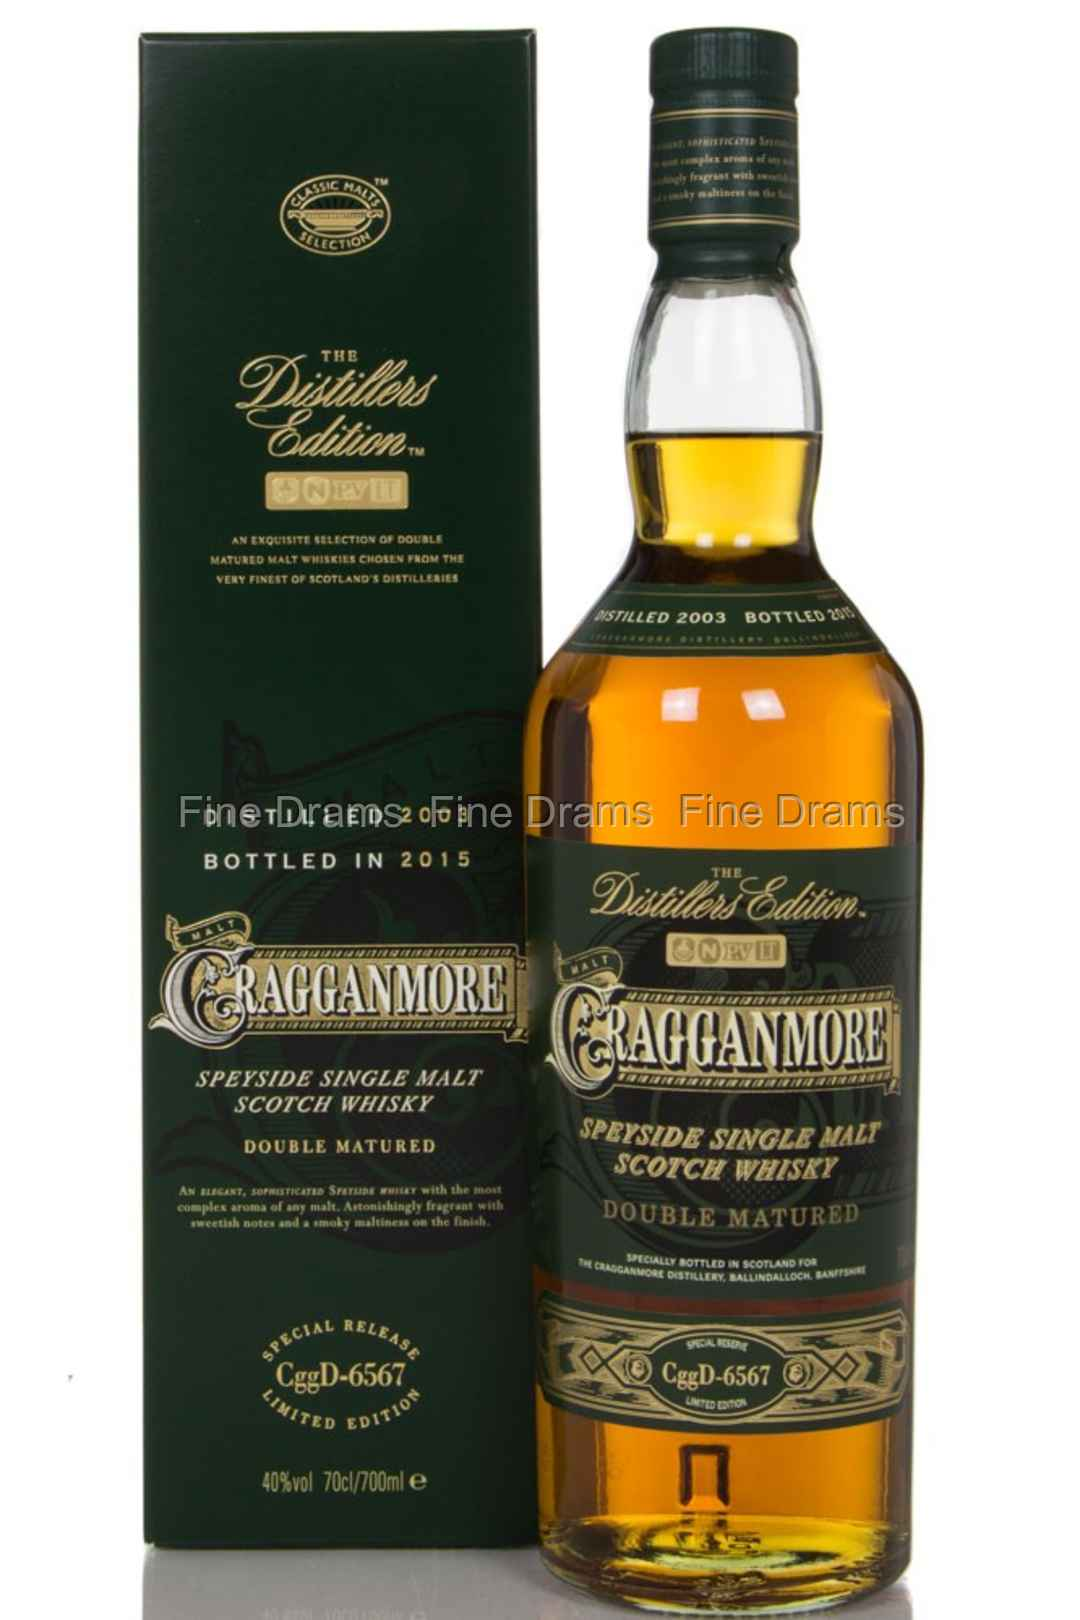 Review #44: cragganmore distiller's edition 2000: scotch.